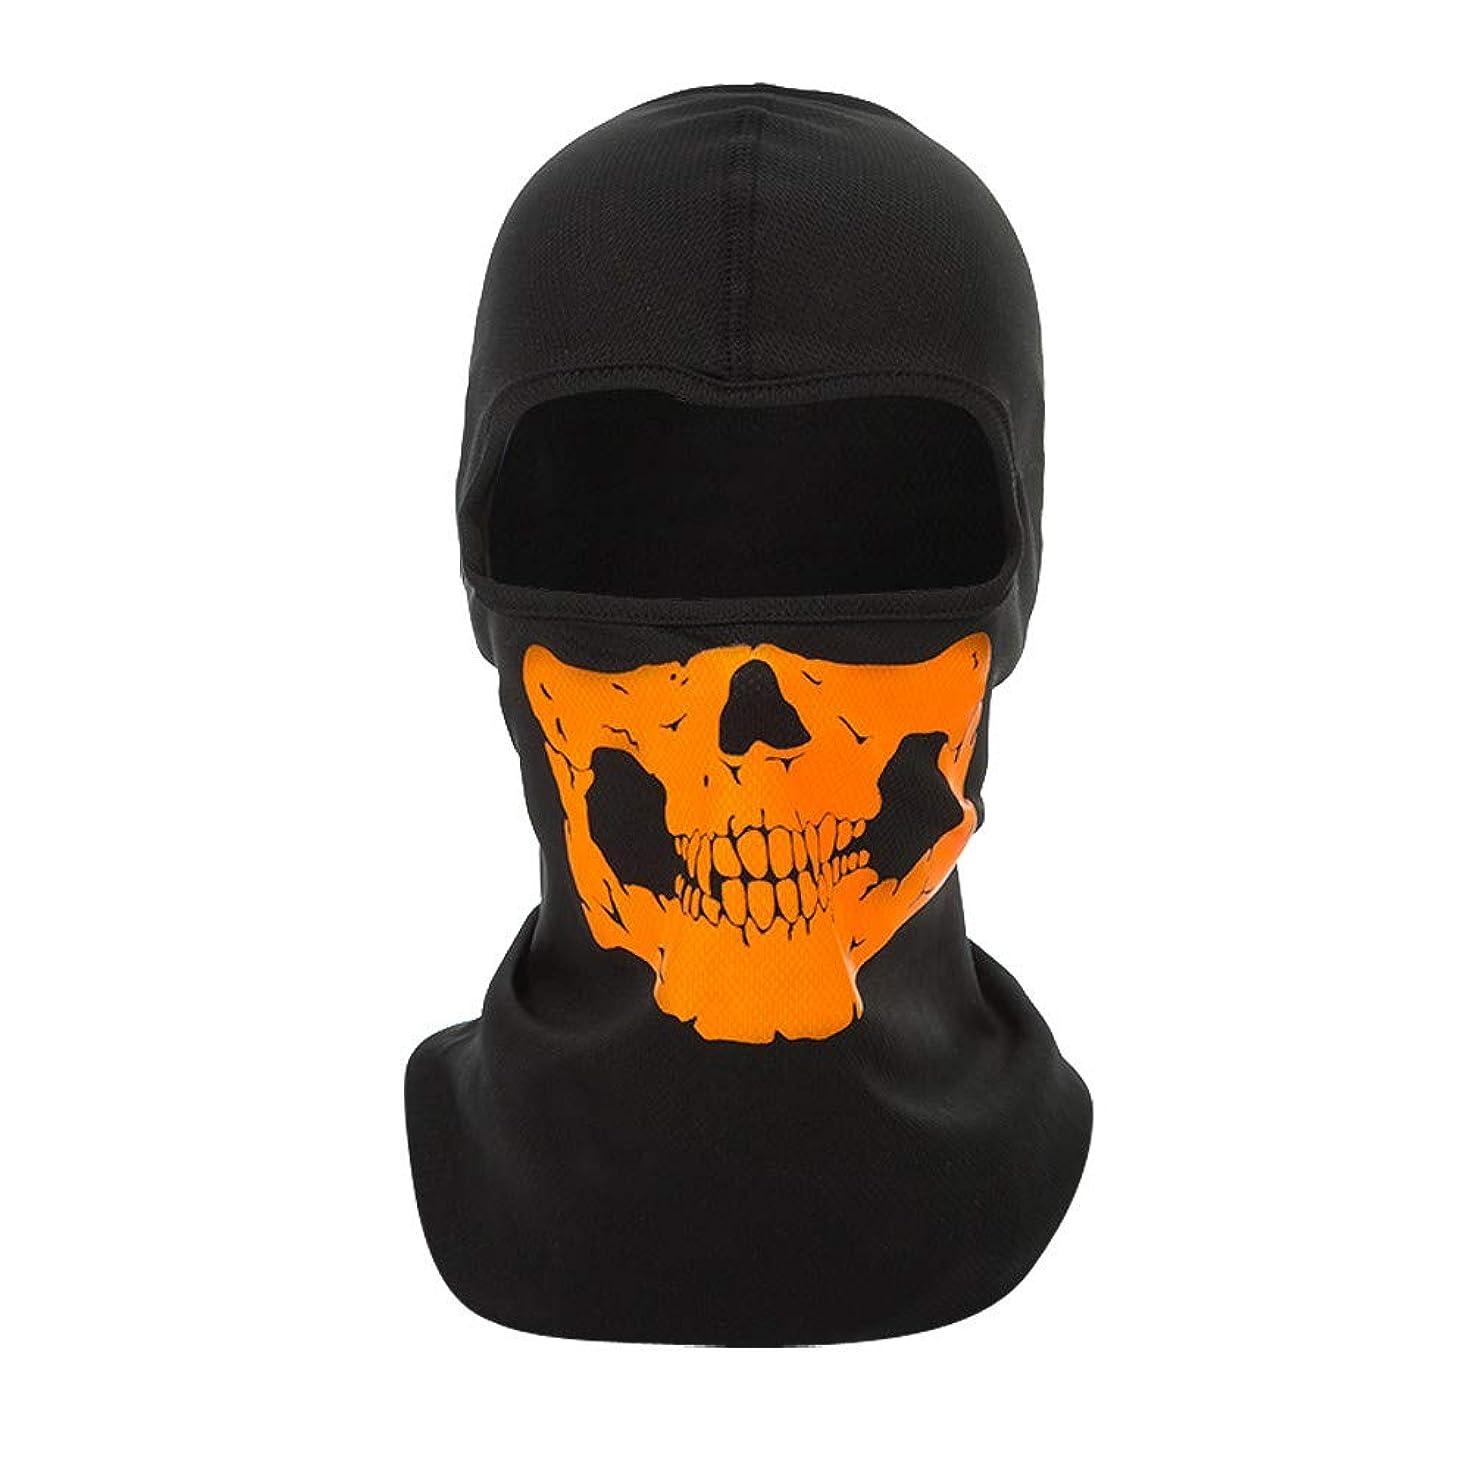 Willsa Halloween Shantou Mask Sunscreen Windproof Dustproof CS Ghost Reflective Mask Headgear